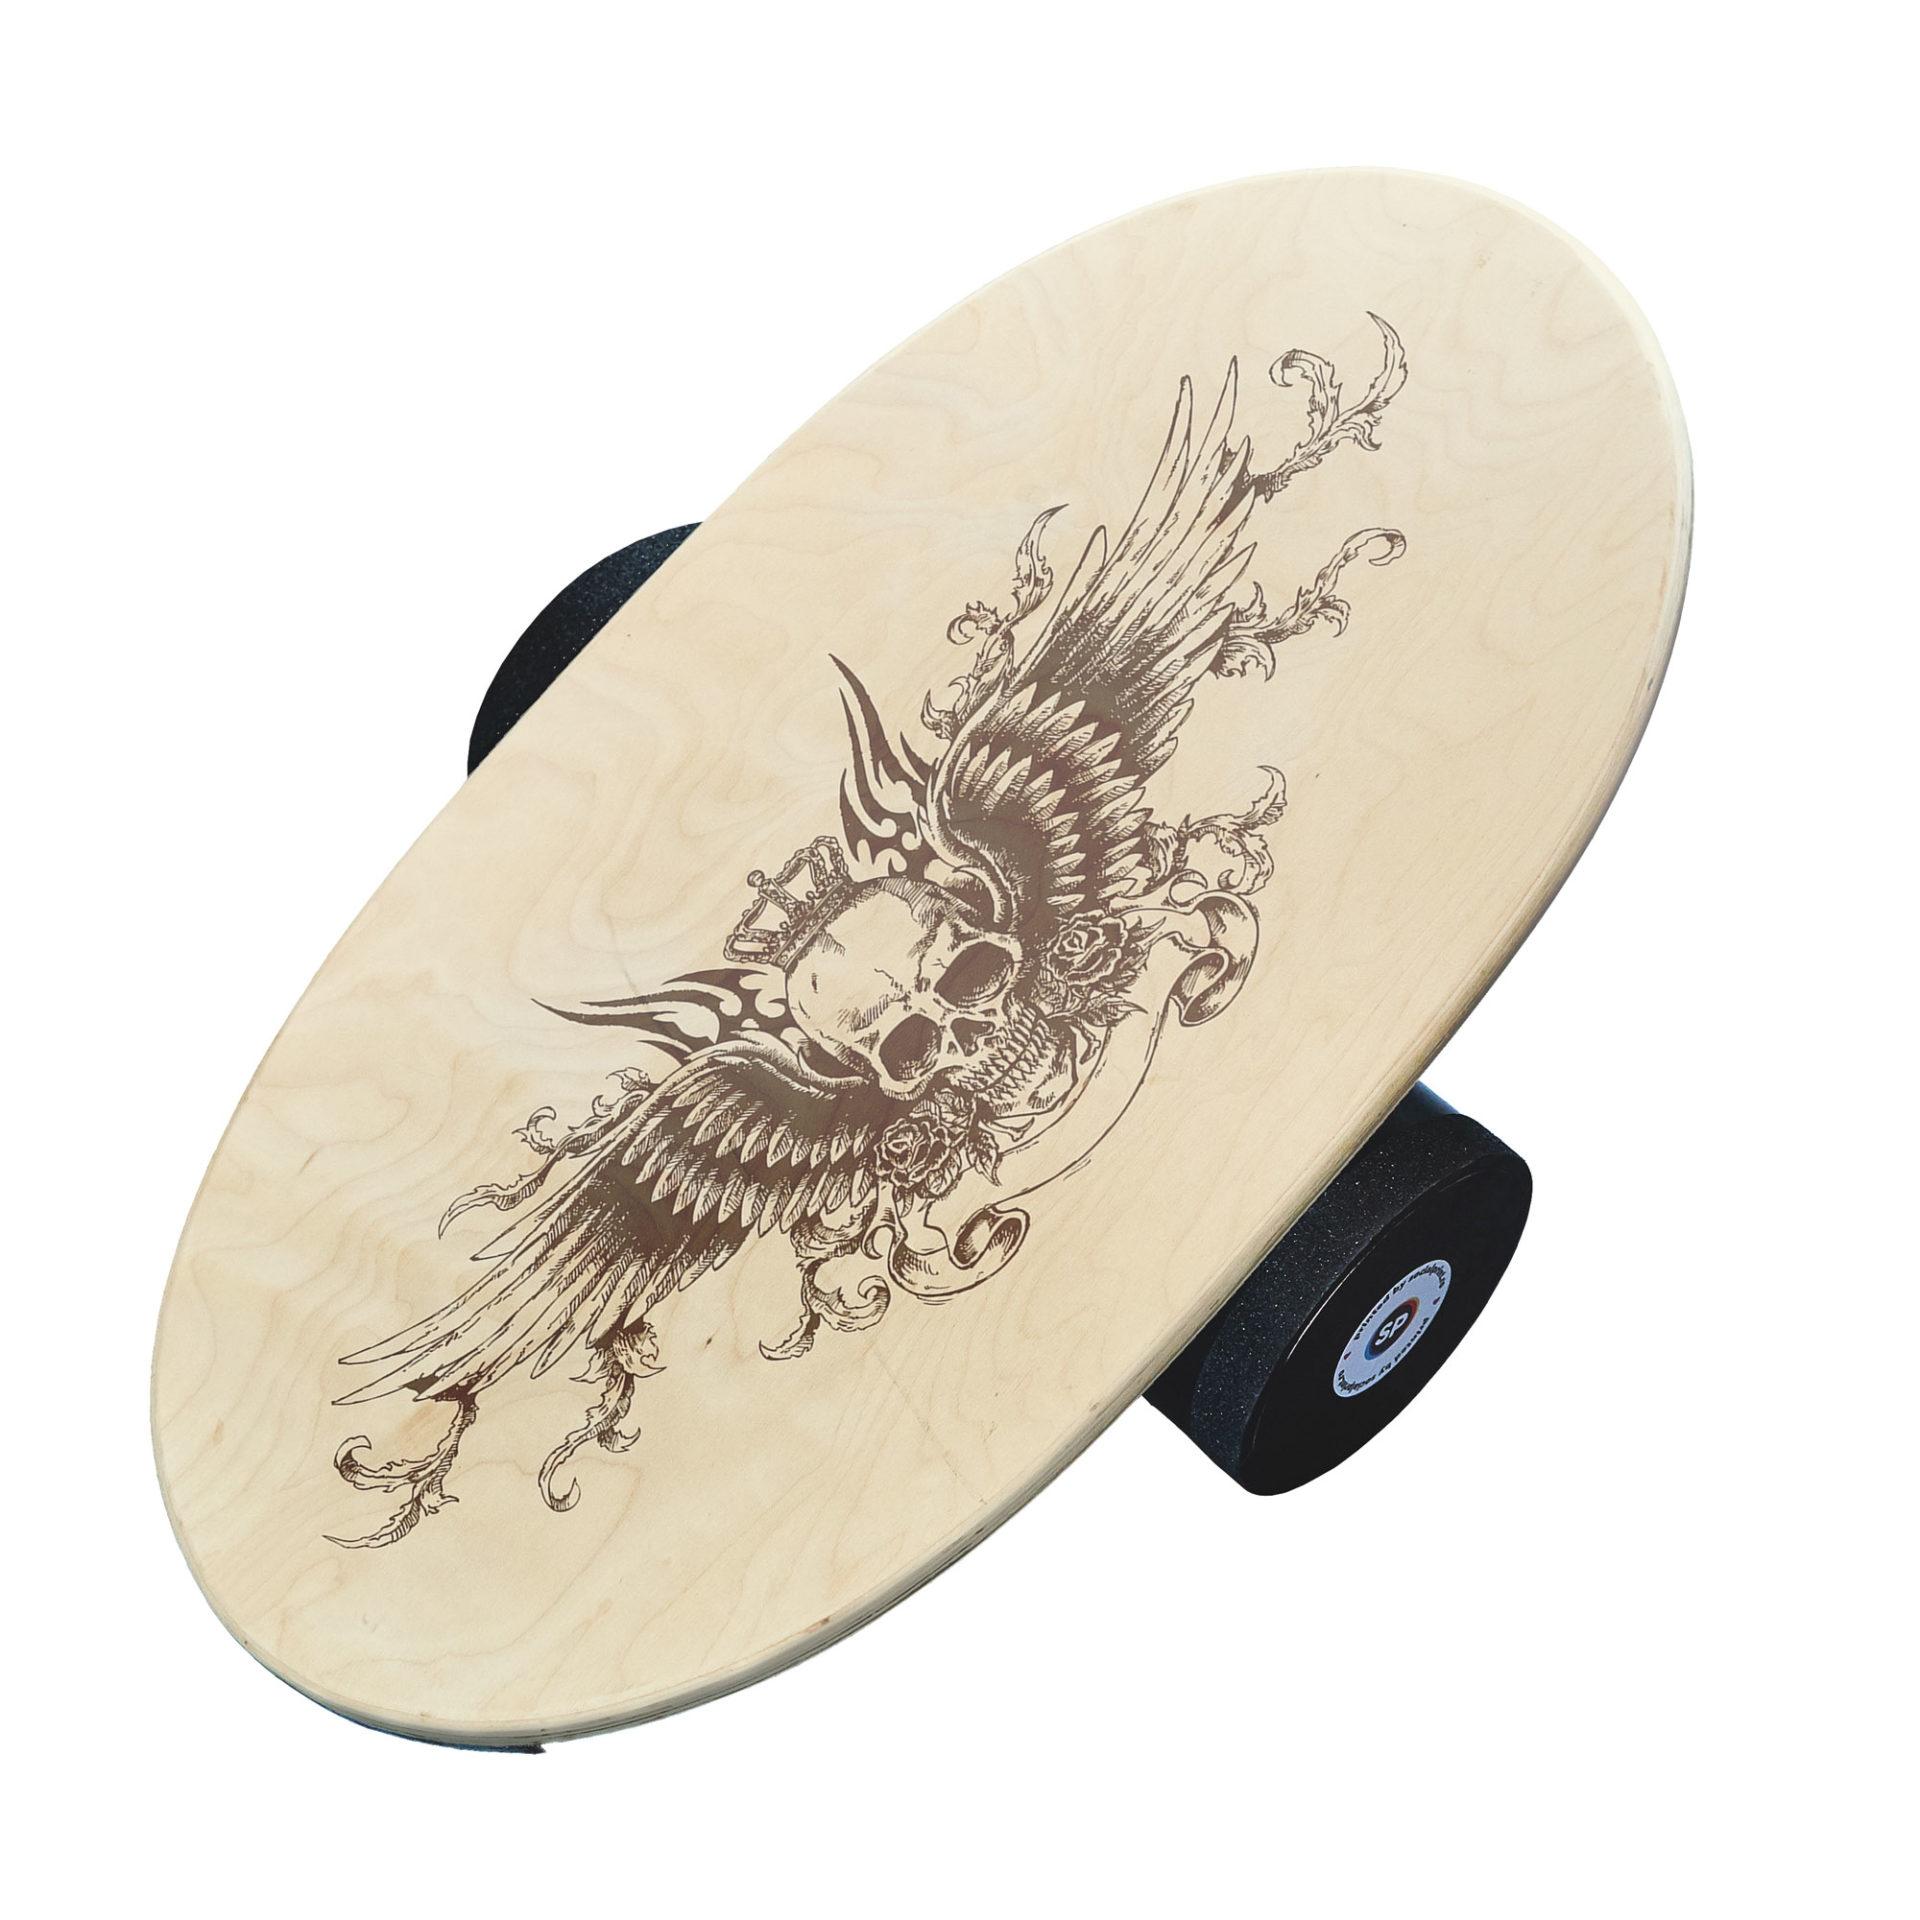 Balance board - Skull Wings